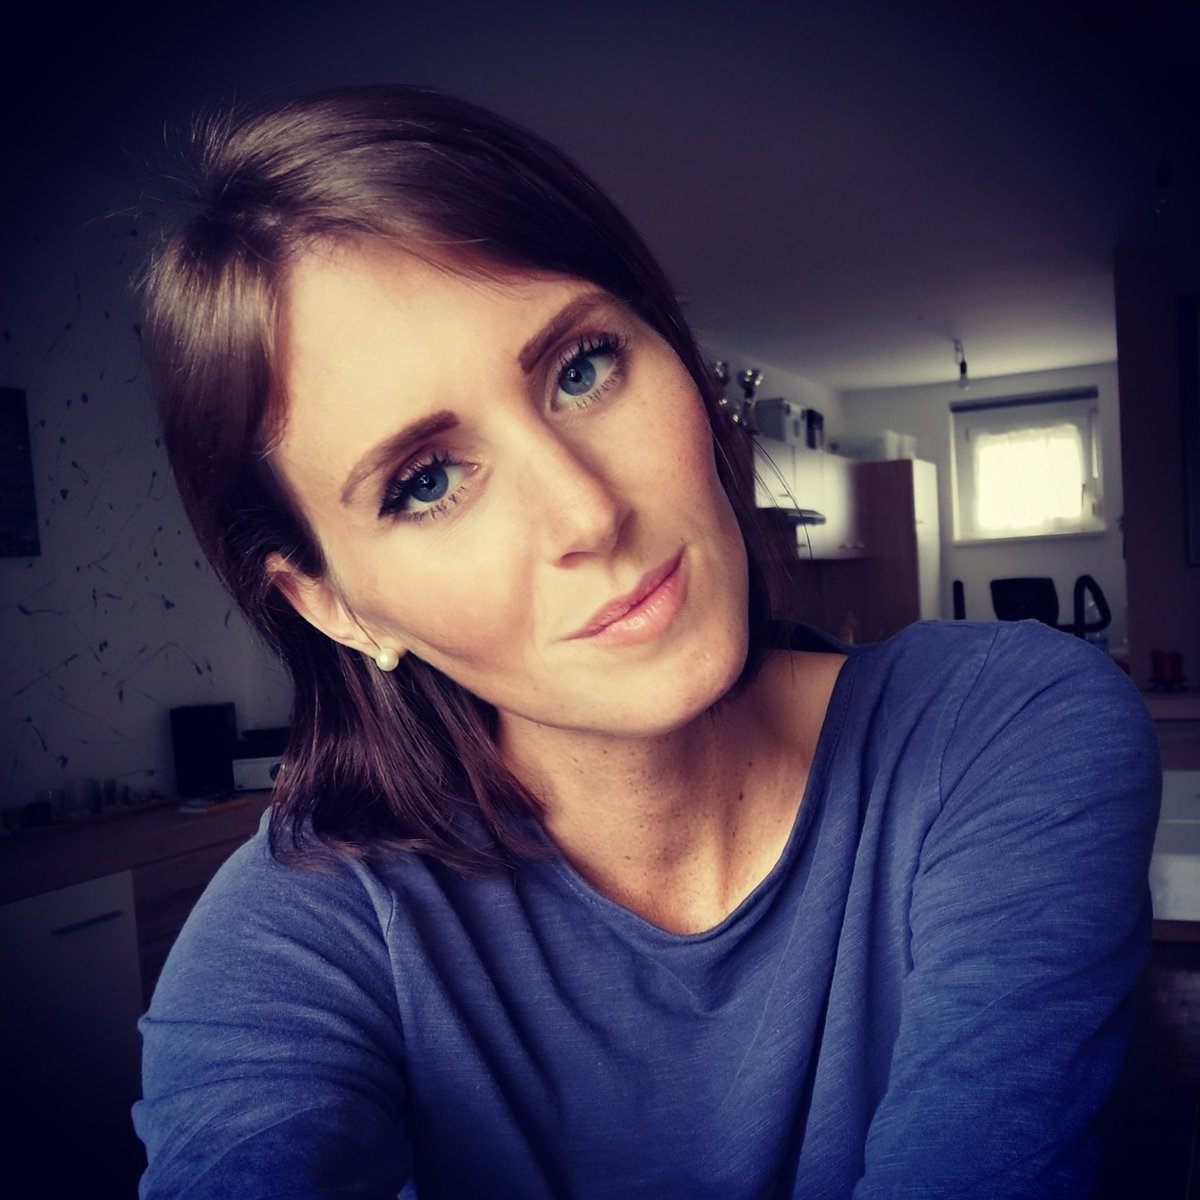 Smile with the world  ... ...  #smile #instagram #instagood #beauty #makeup #styleblogger #fotografia #photooftheday #photografy #selfie #selfietime #Instagram #model #modelmanagement #nextmodel #fotoshooting #happy #fotografie #fashion #fashionblogger #blogger #stylingpic.twitter.com/0mLJULCtom